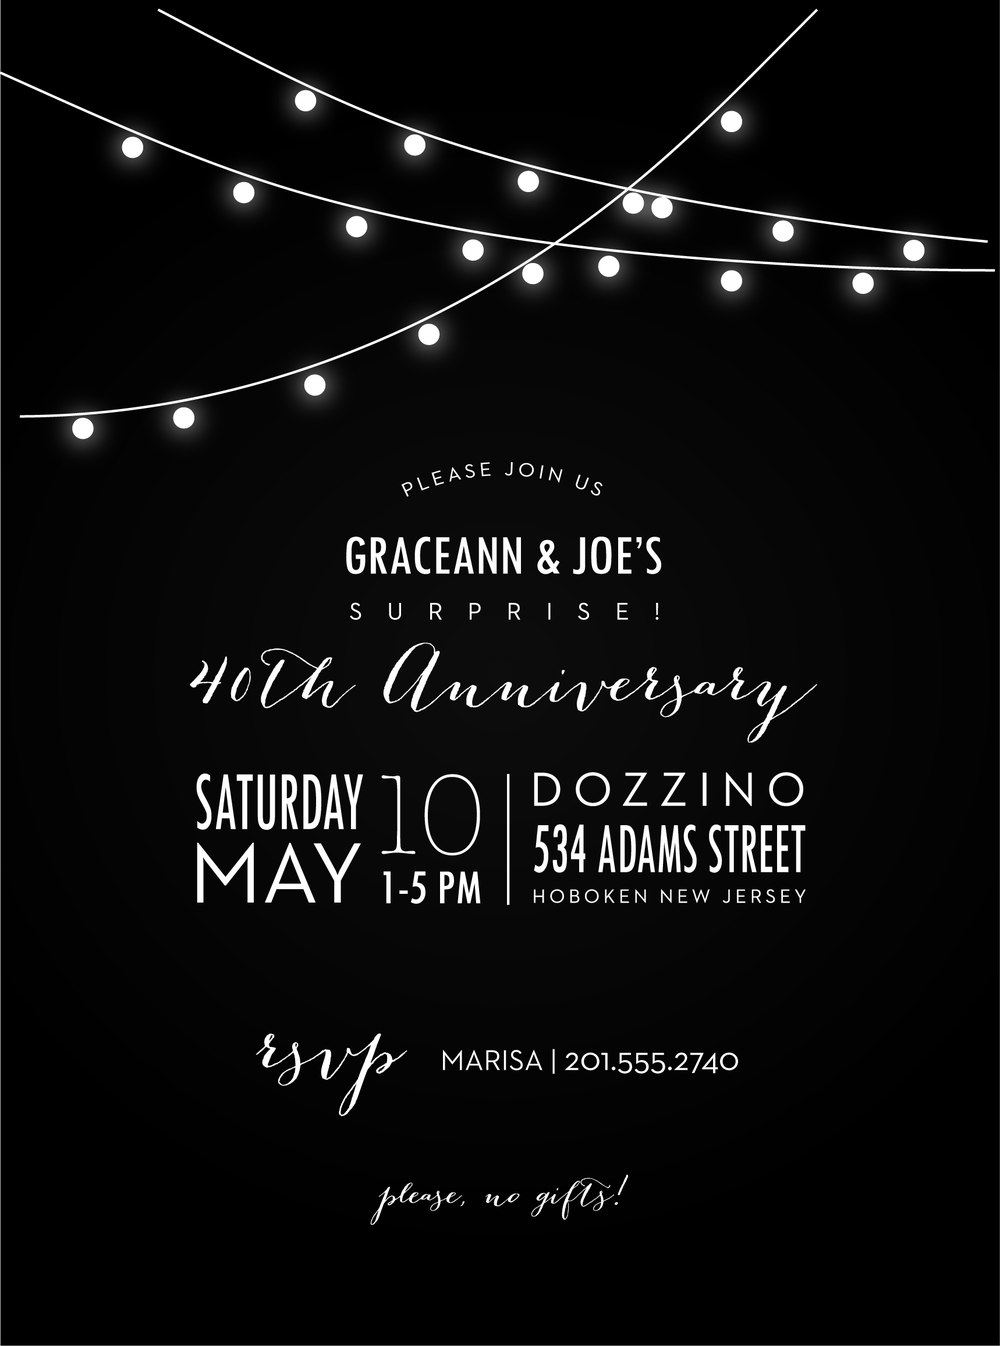 Graceann&Joe Invite.jpg